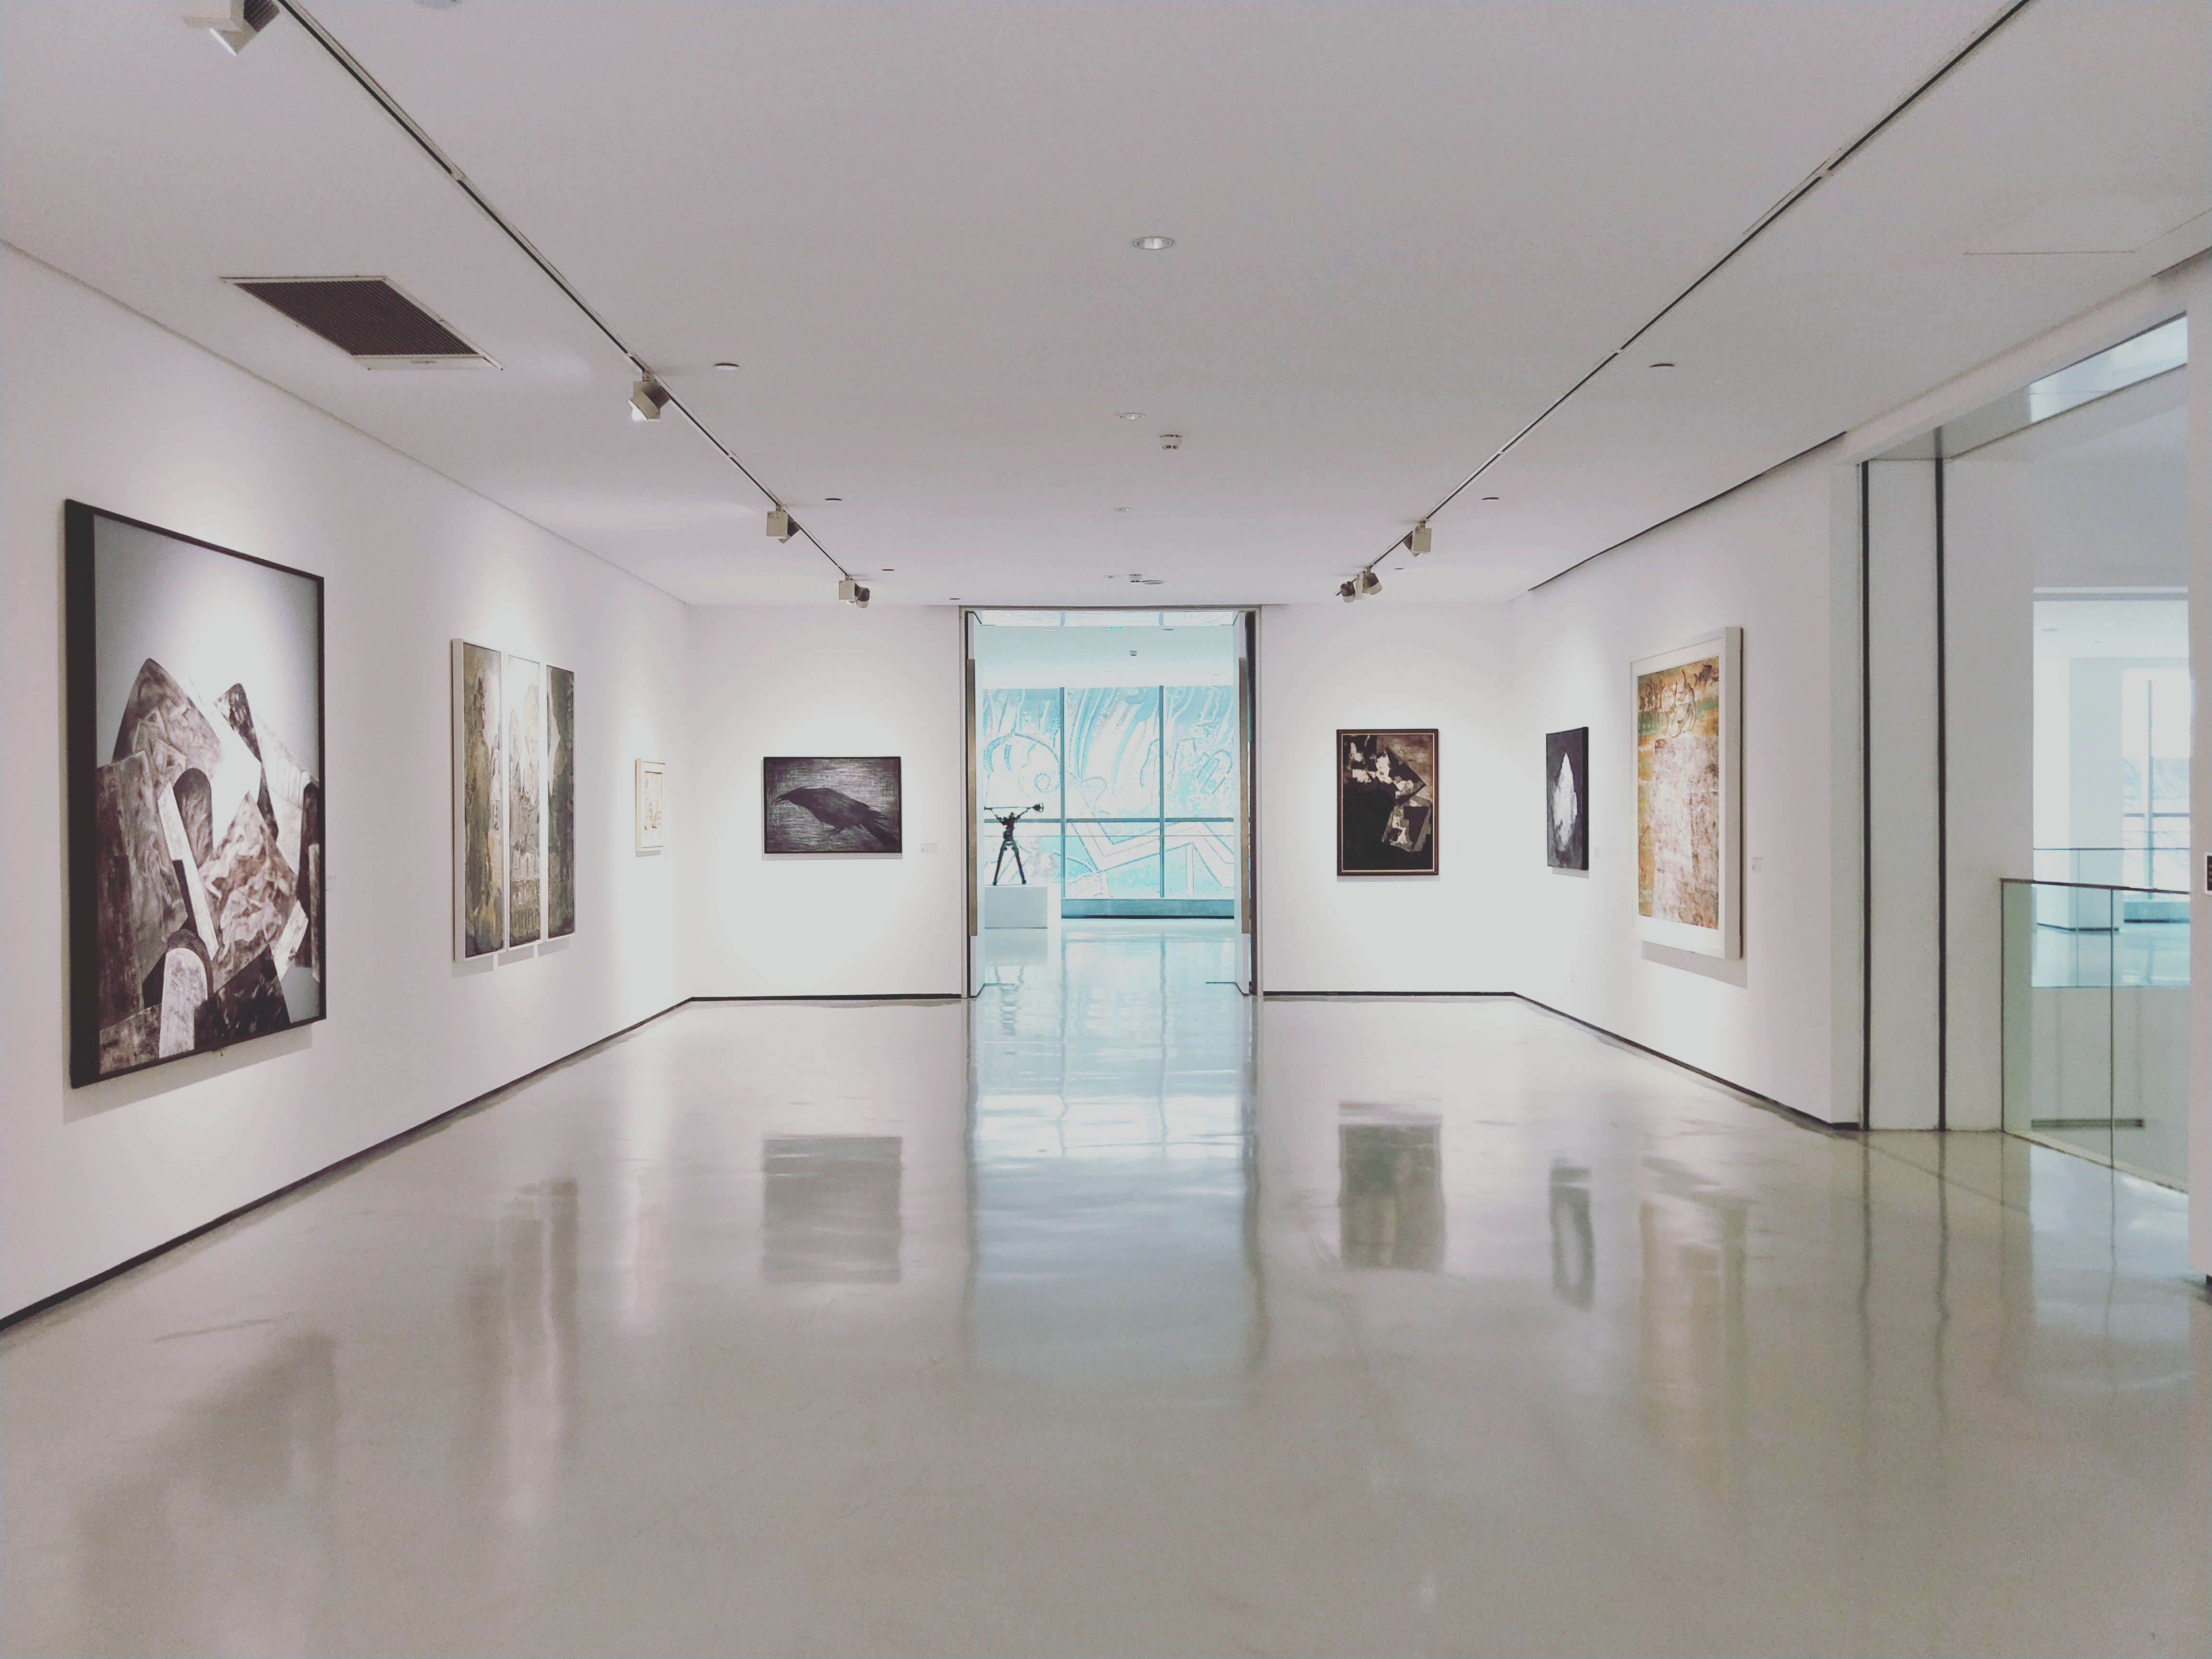 Art Gallery | © Deanna J / Unsplash